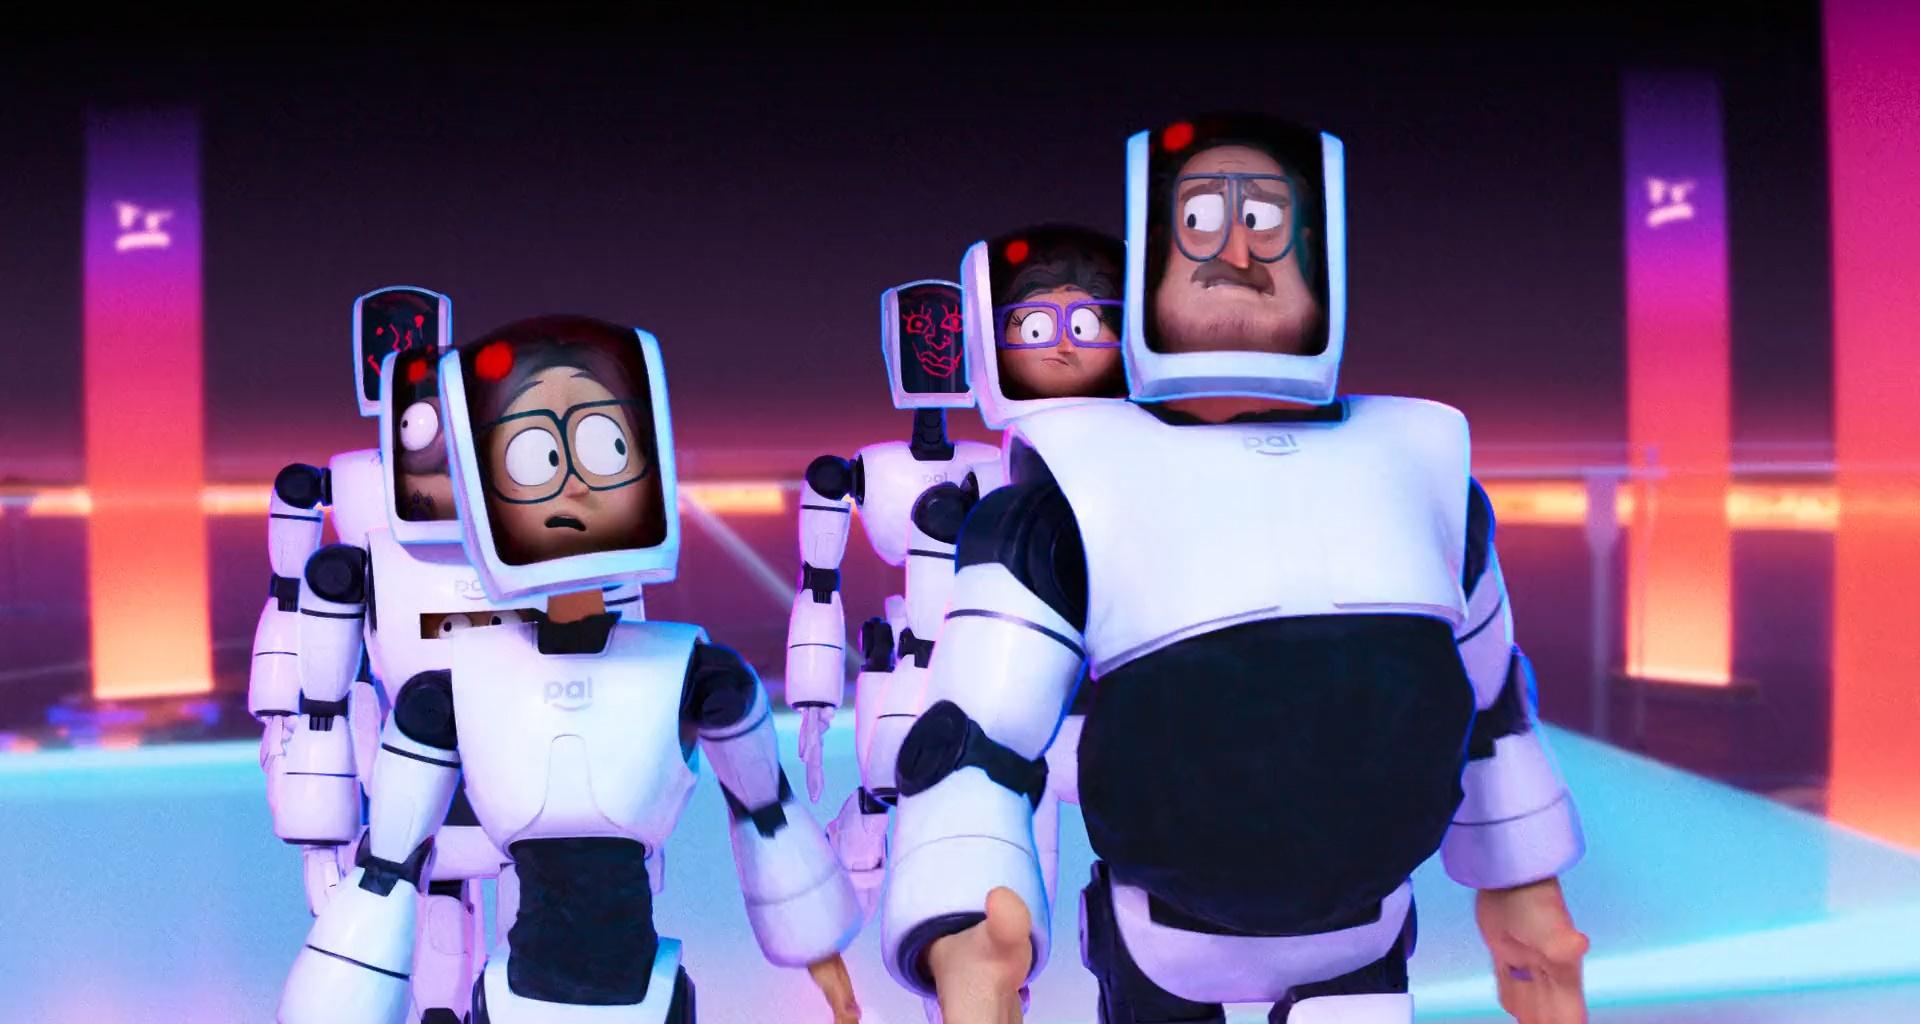 Ailem Robotlara Karşı   2021   WEB-DL   XviD   Türkçe Dublaj   m720p - m1080p   WEB-DL   Dual   TR-EN   Tek Link